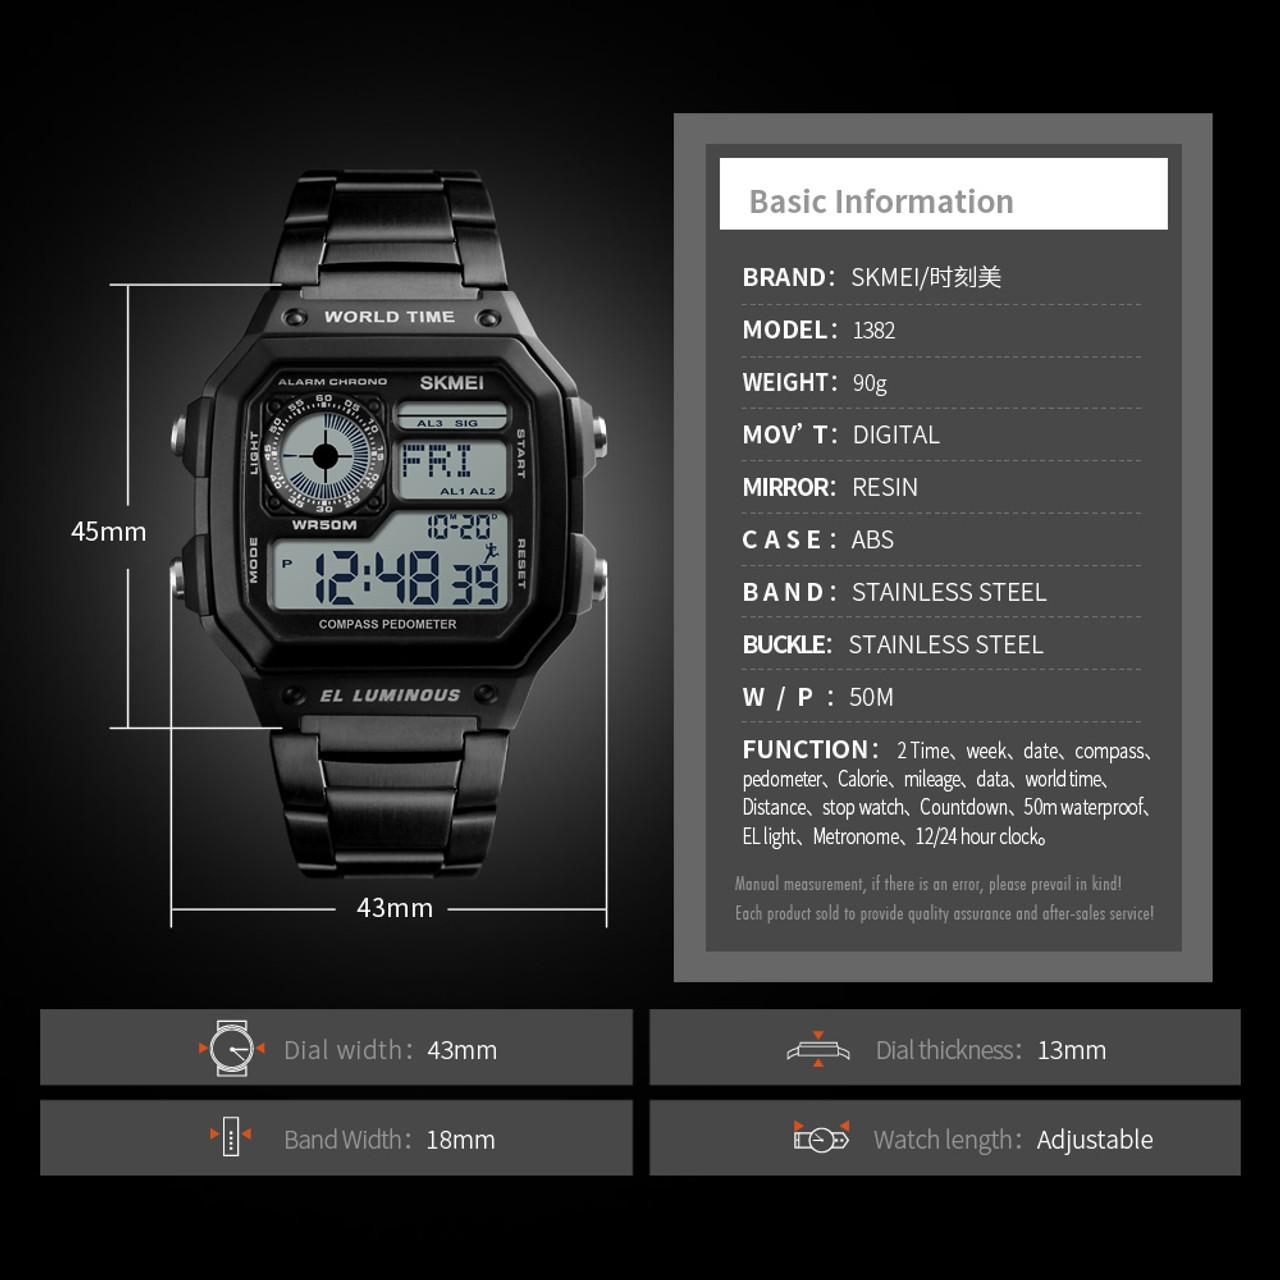 fa040edffff5 ... Compass Countdown Digital Sports Watches SKMEI Mens Watches Top Brand  Luxury Pedometer Calories Waterproof Men Wrist ...